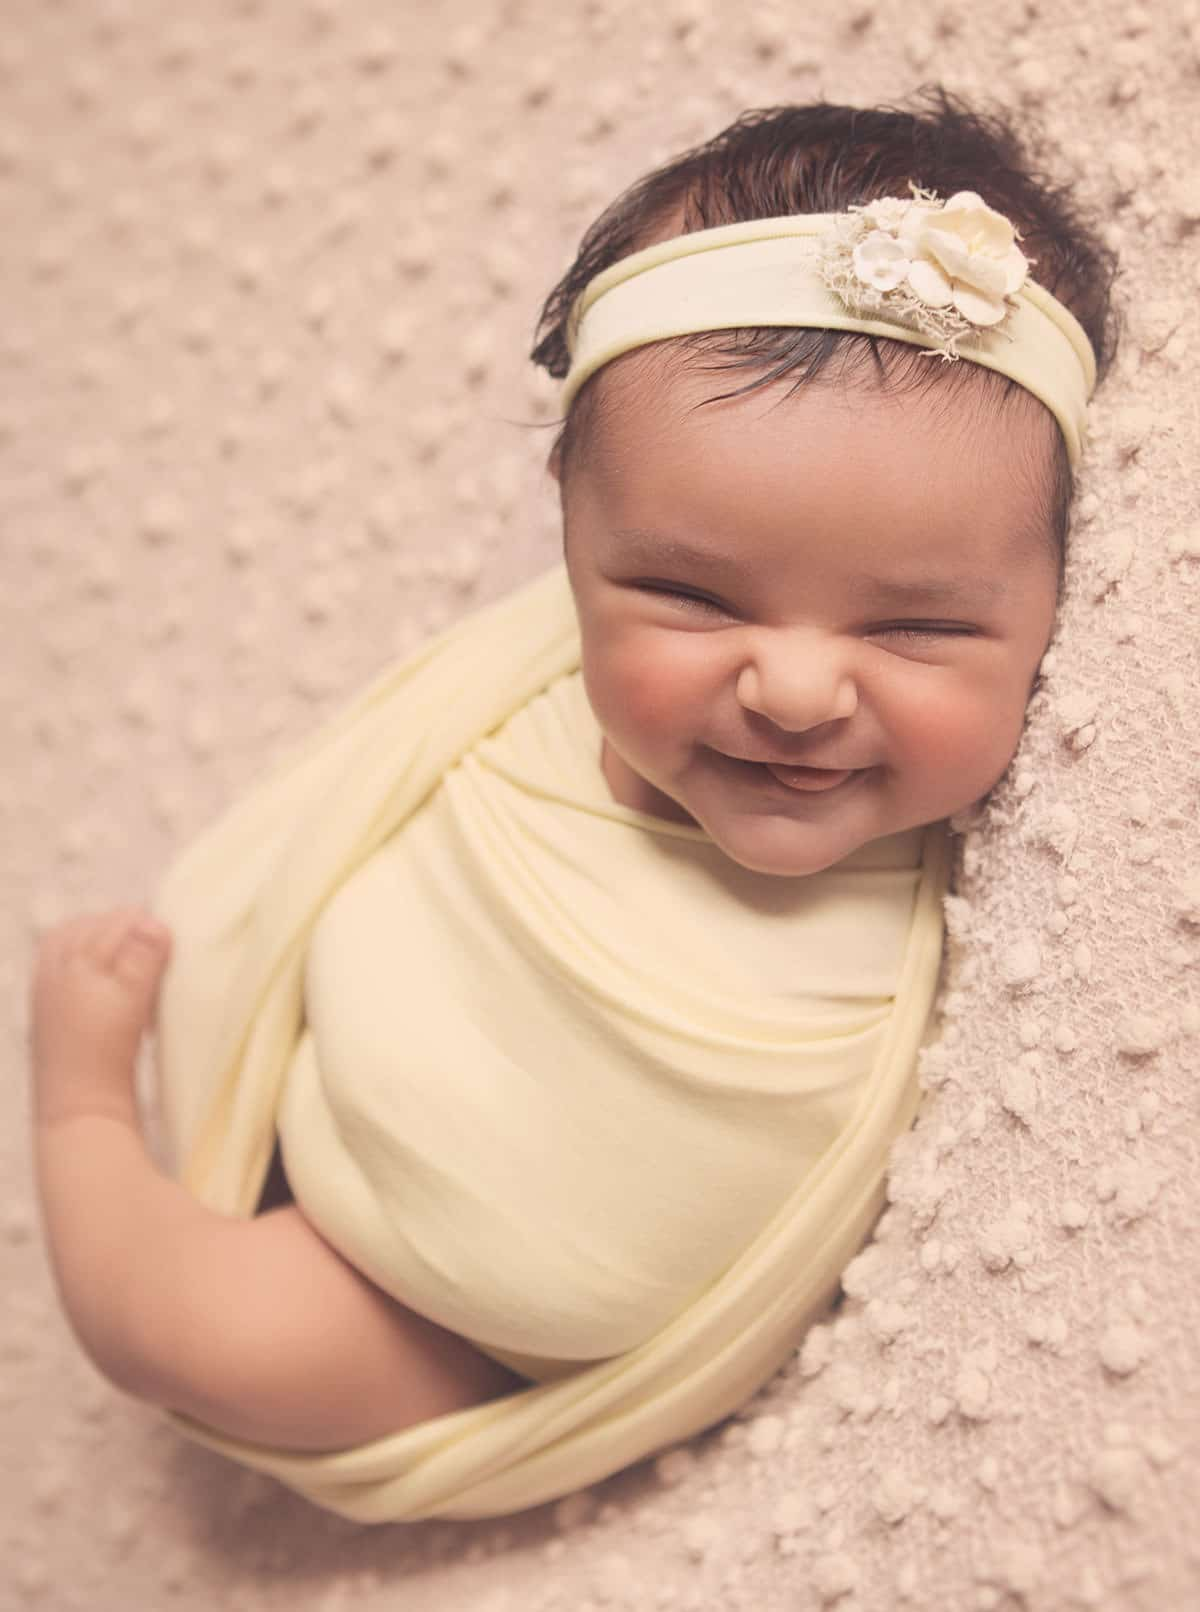 Newborn baby girl swaddled in yellow blanket smiling.